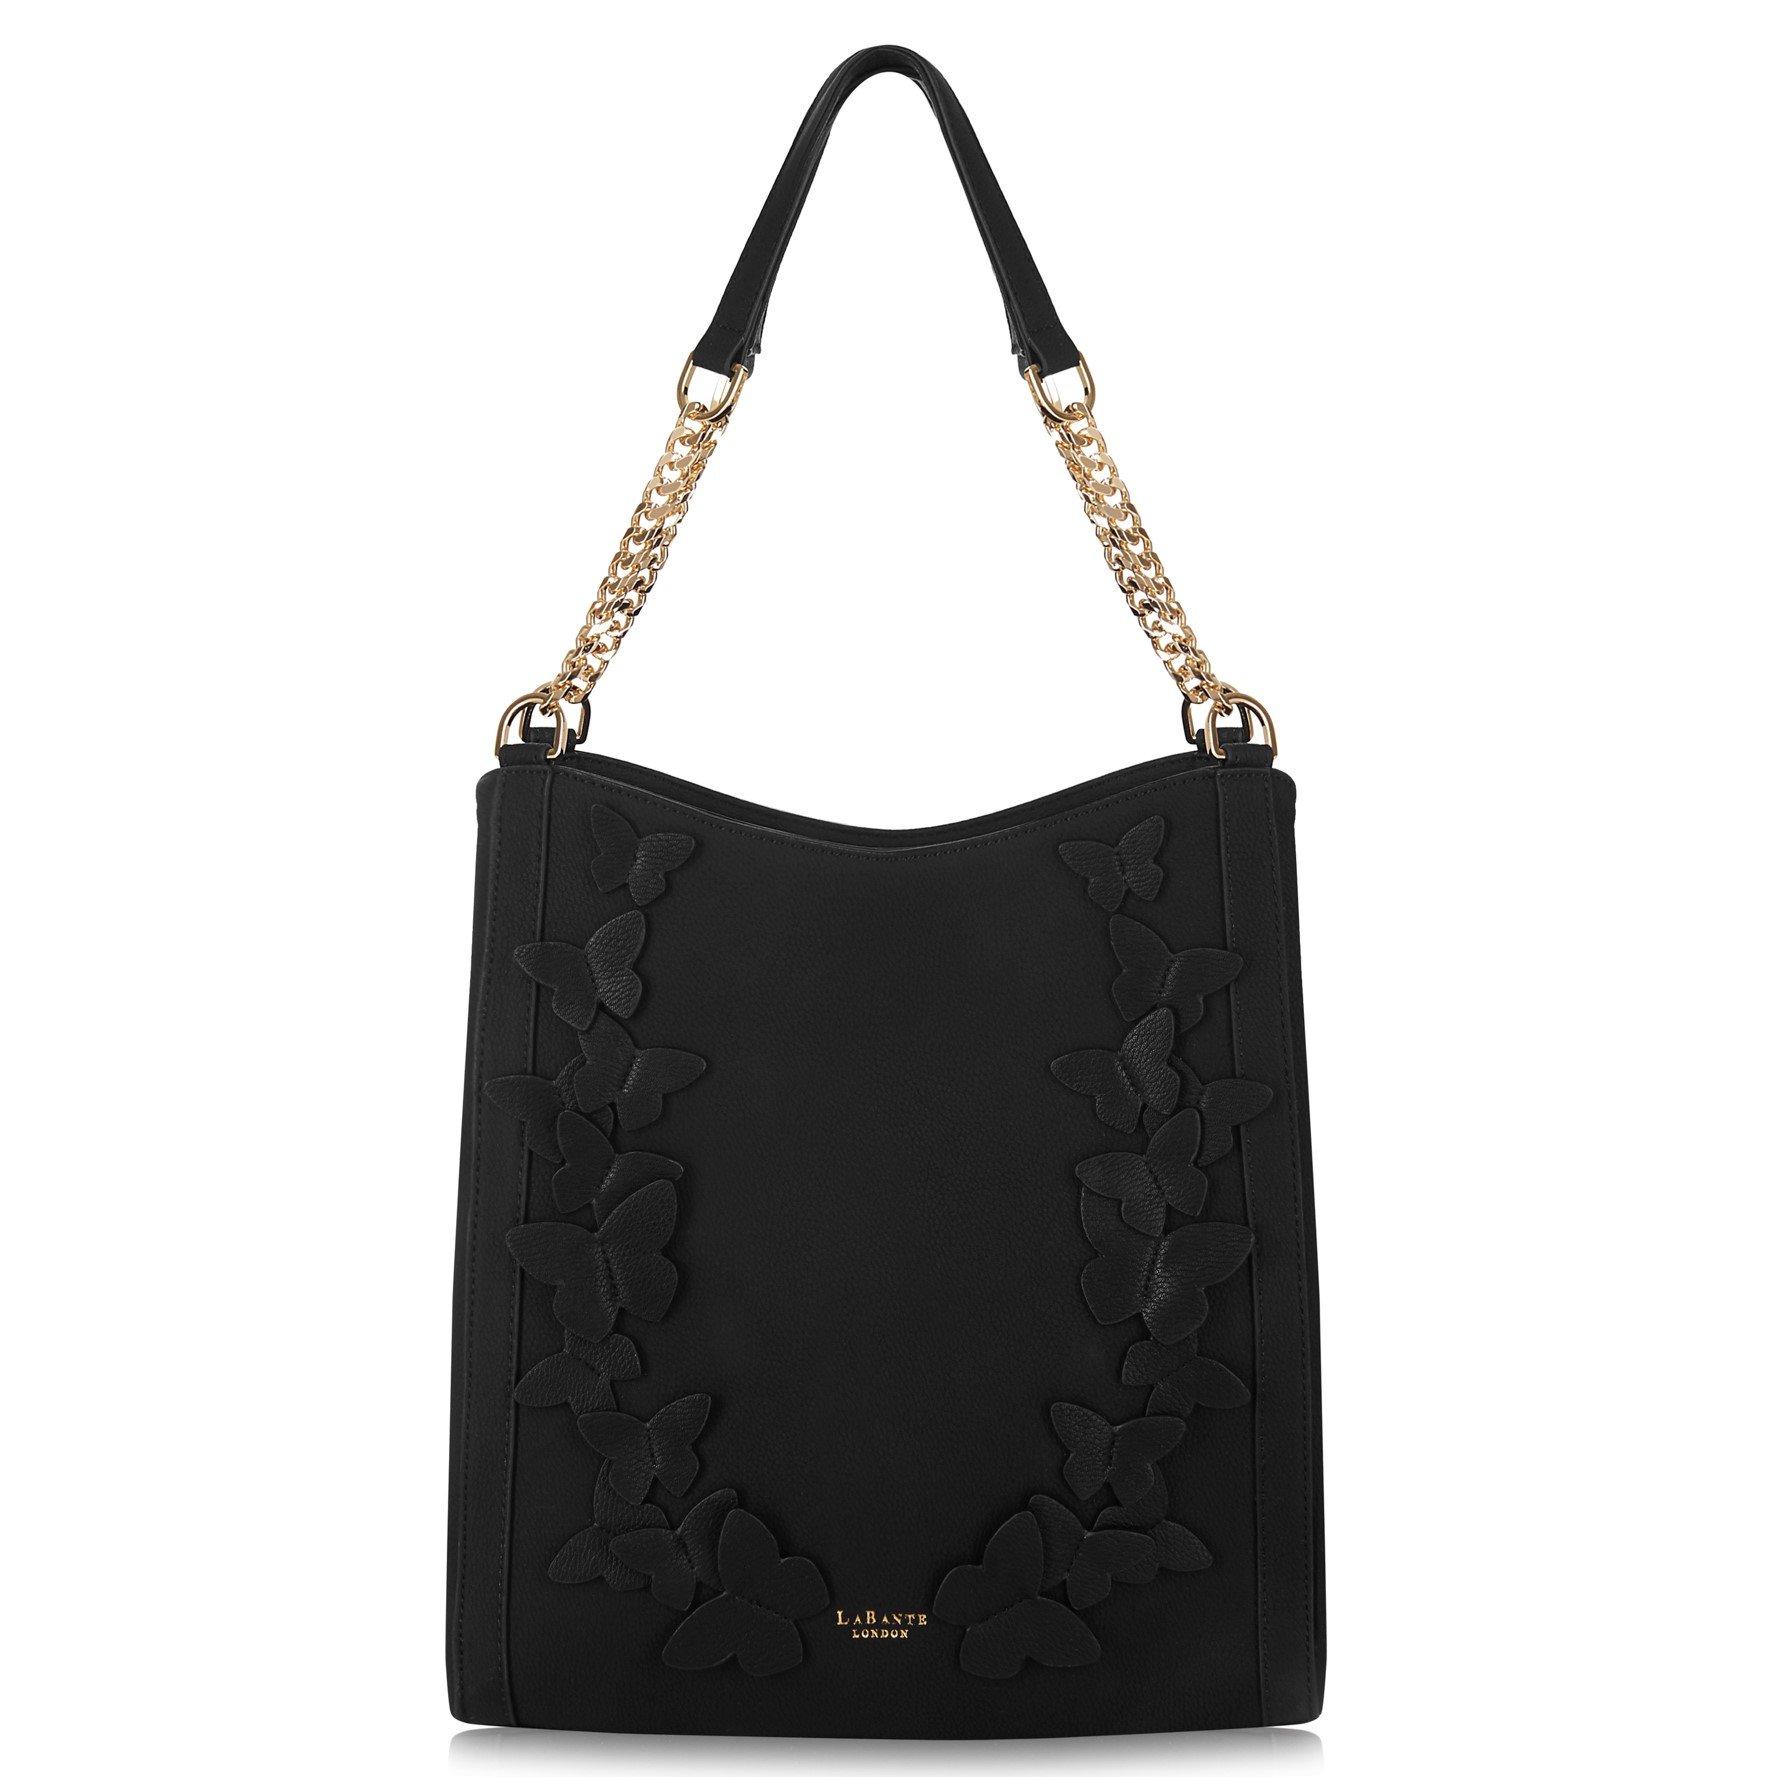 LaBante London 'Sylvaine' Vegan Leather Hobo Handbag for Women by LABANTE